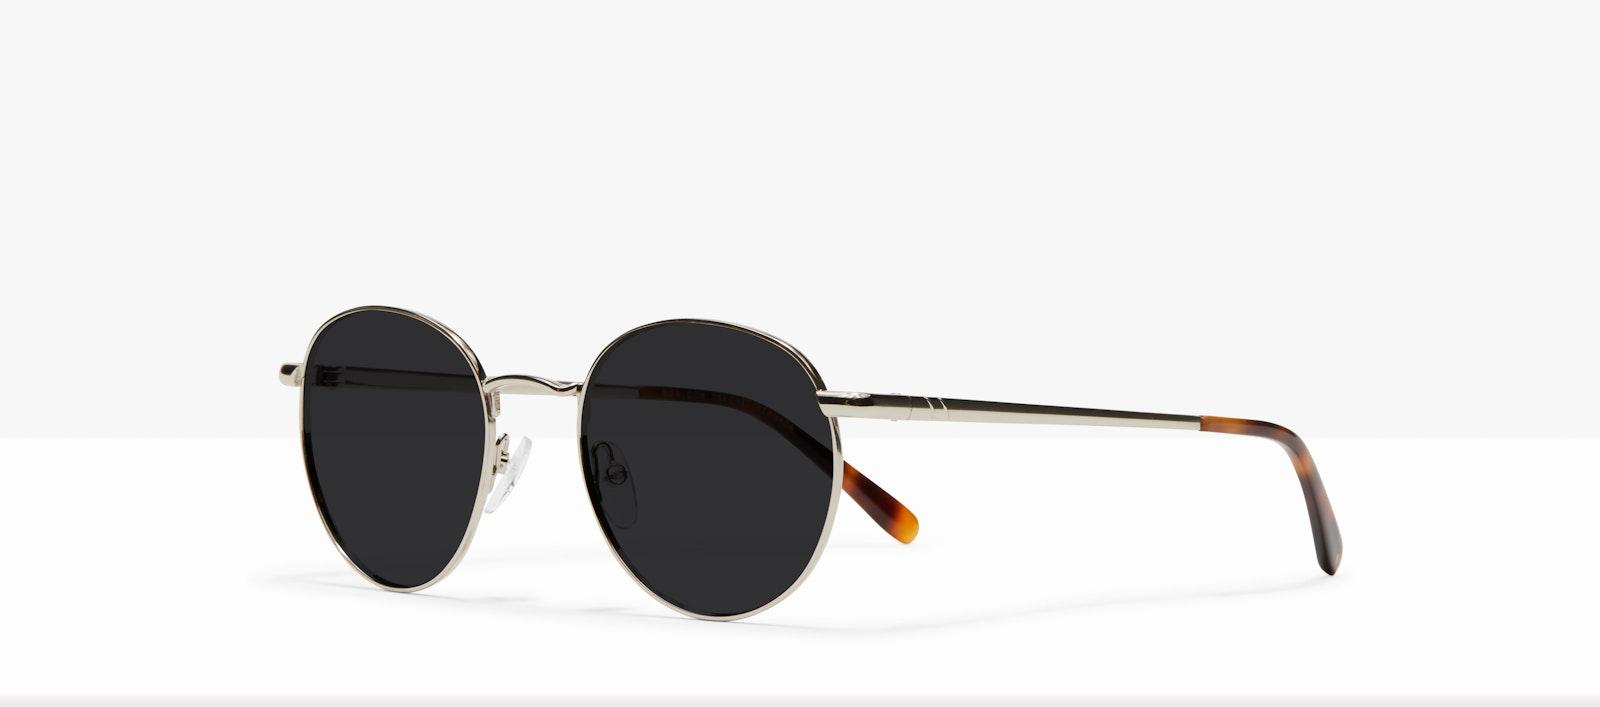 Affordable Fashion Glasses Round Sunglasses Men Women Dynasty M Silver Tilt